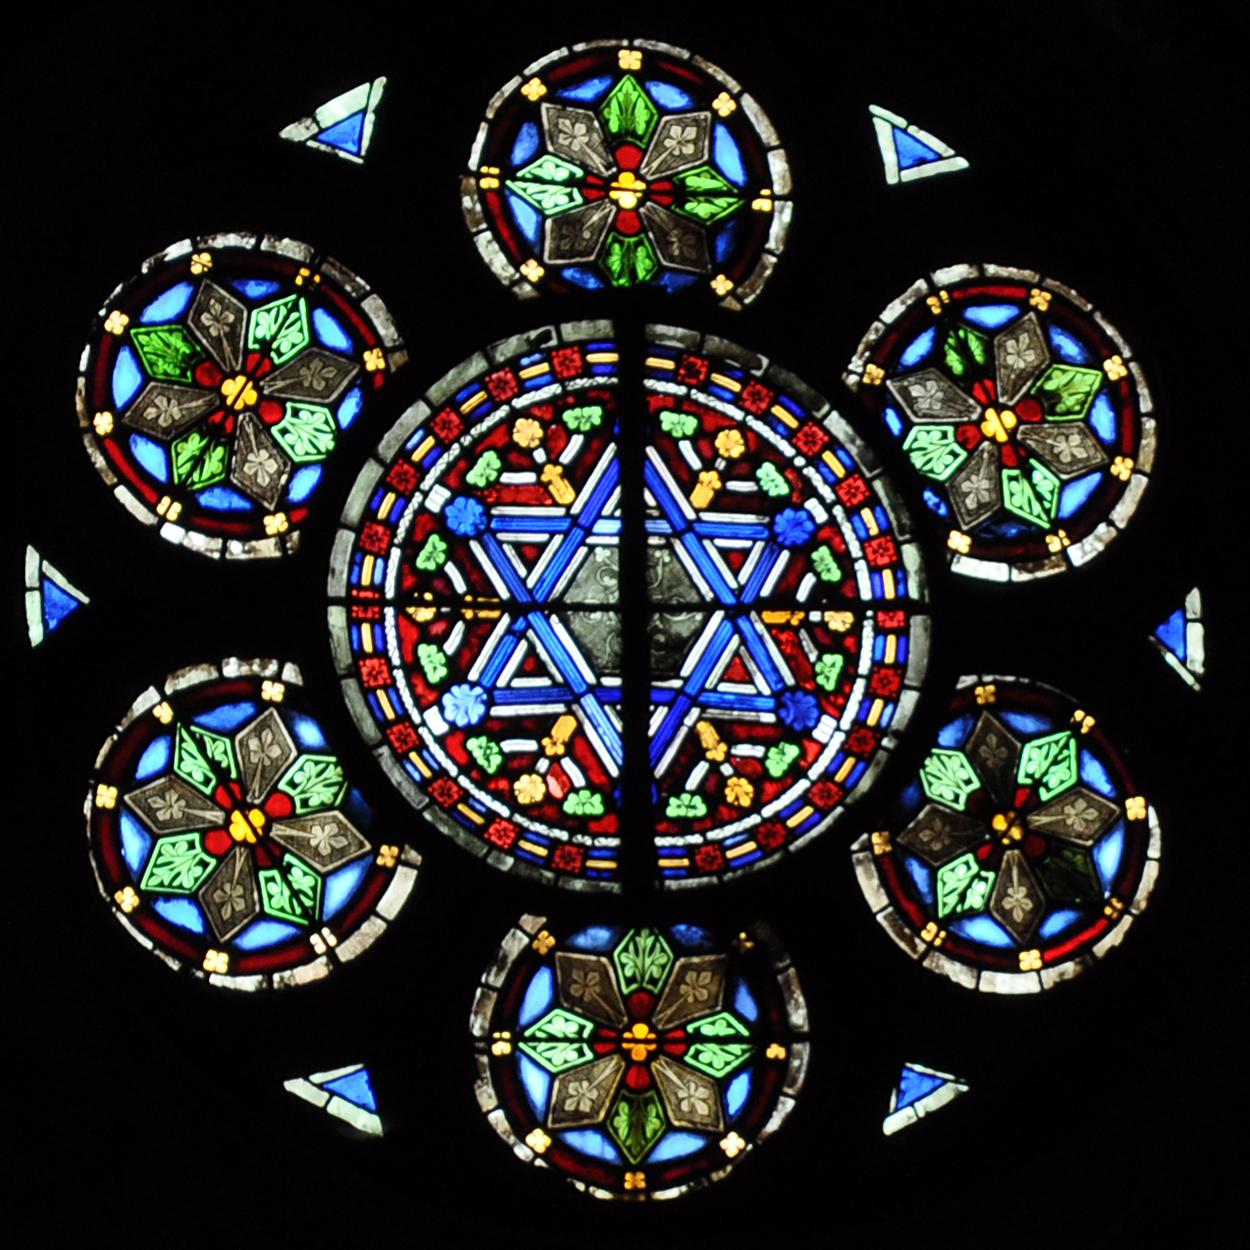 Vitraux Metz file:metz cathédrale vitraux 121209 14 - wikimedia commons